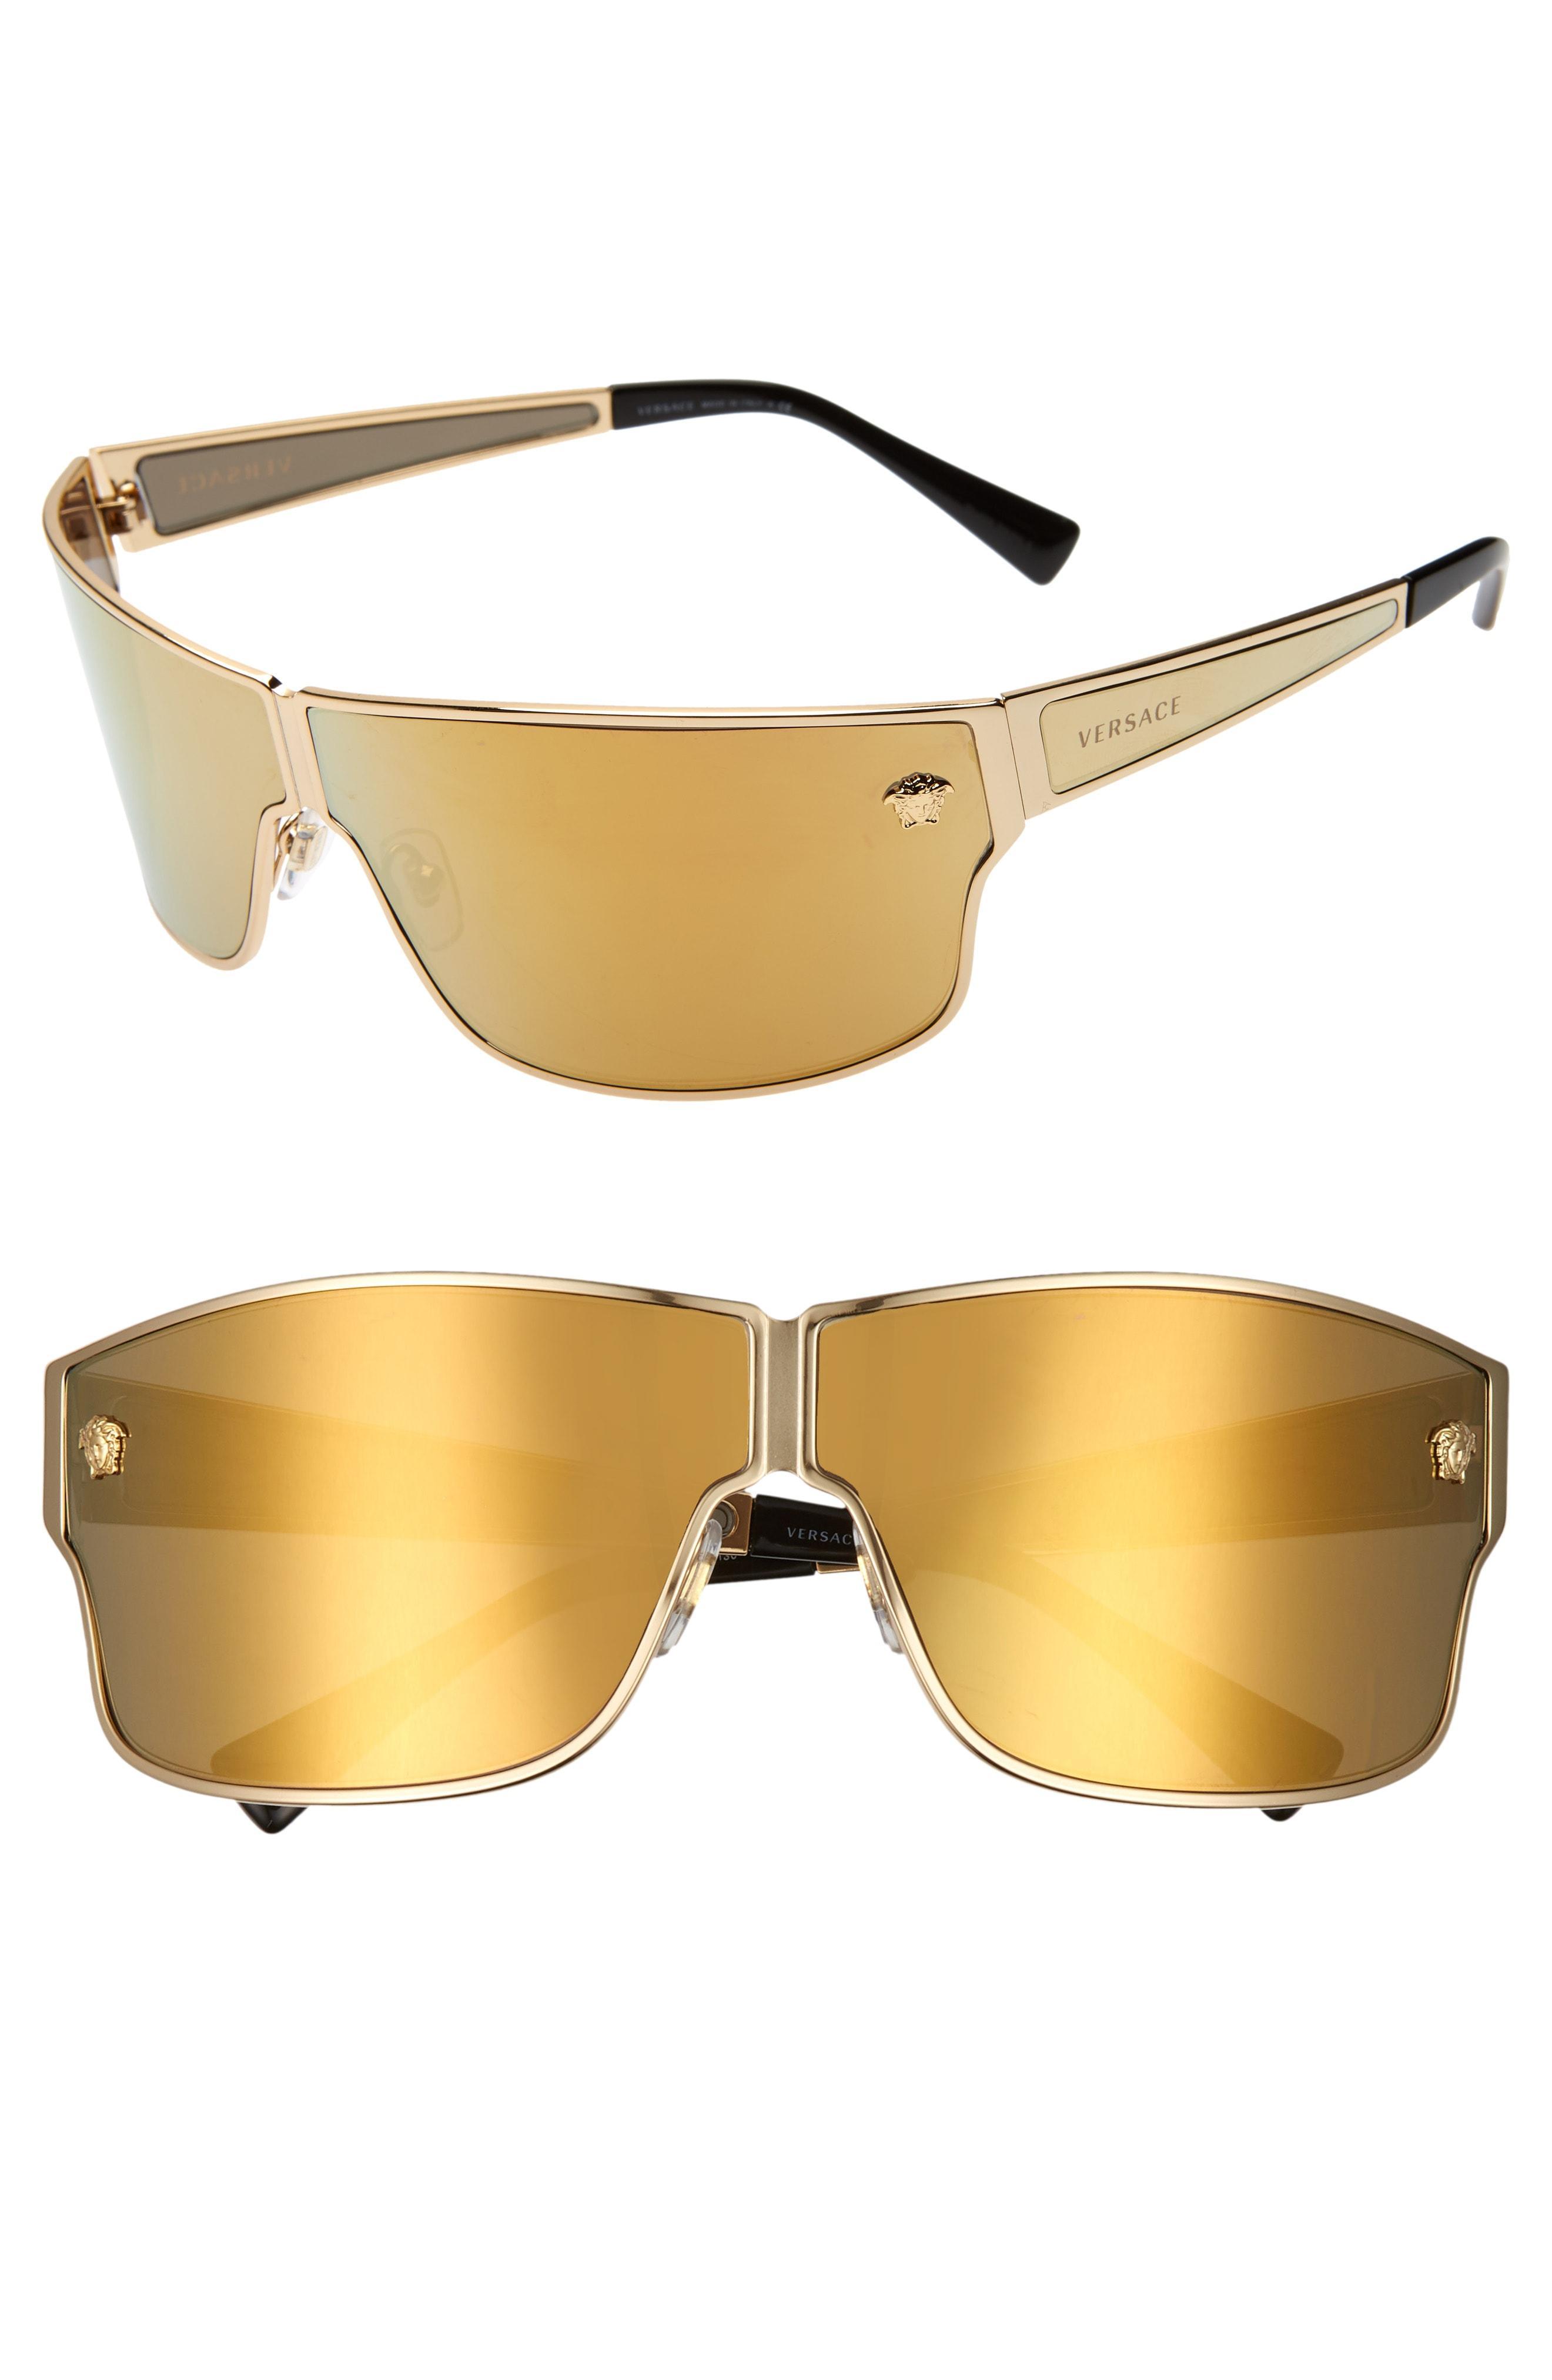 5a6d91b7236 Versace - Metallic Medusa 72mm Mirrored Shield Sunglasses - Lyst. View  fullscreen